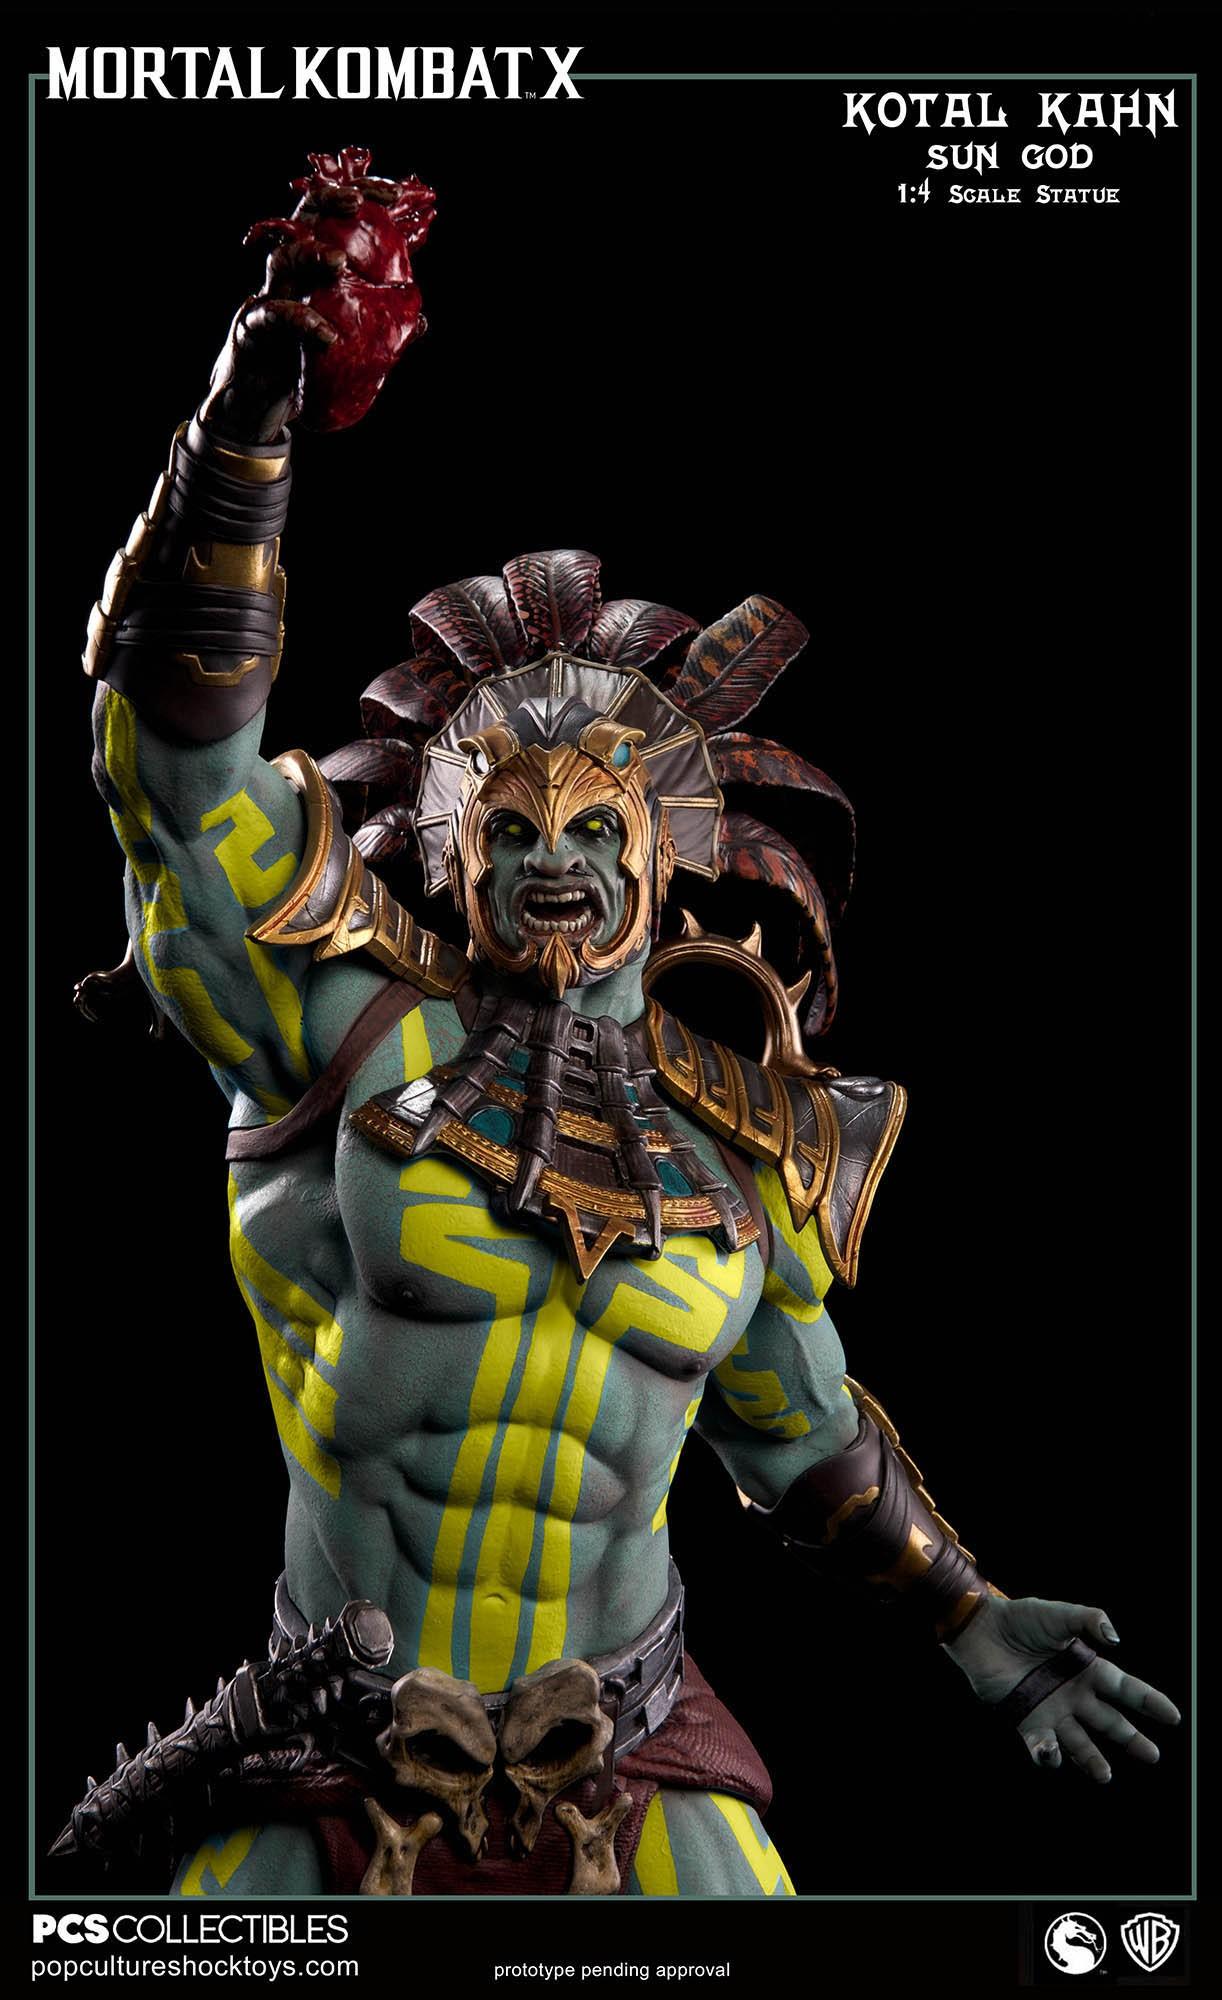 [Pop Culture Shock] Mortal Kombat X: Kotal Kahn 1:4 scale PCS-Kotal-Kahn-Sun-God-020